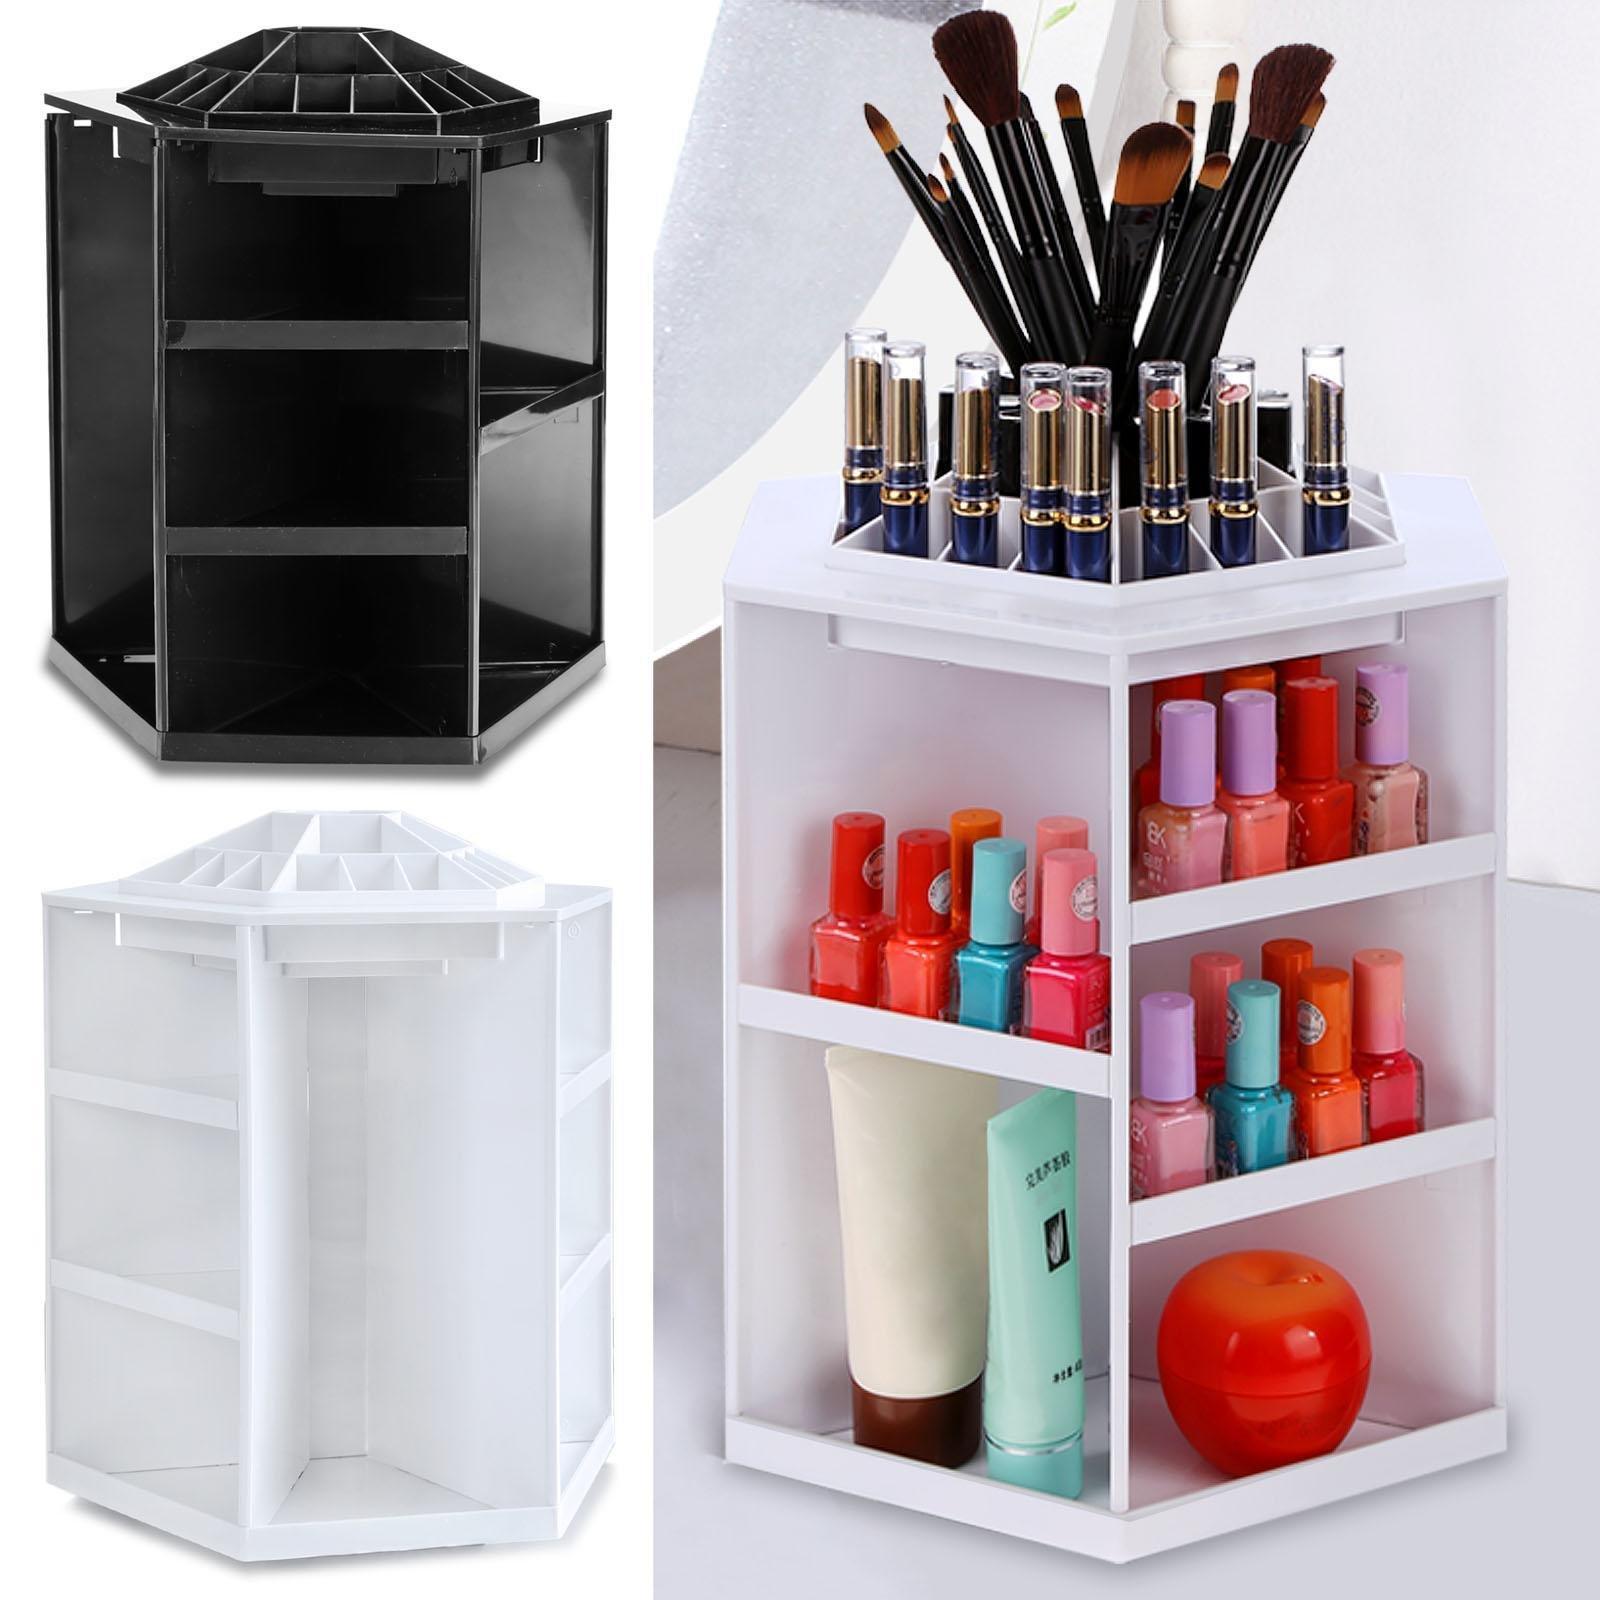 Mewalker 360 Degree Cosmetic Storage Box, Rotating Makeup Organizers Multi-Functional Makeup Cosmetic Organizer For Home Women Girl Makeup Brushes, Lipsticks, Fits Toner, Creams (US STOCK) (White)